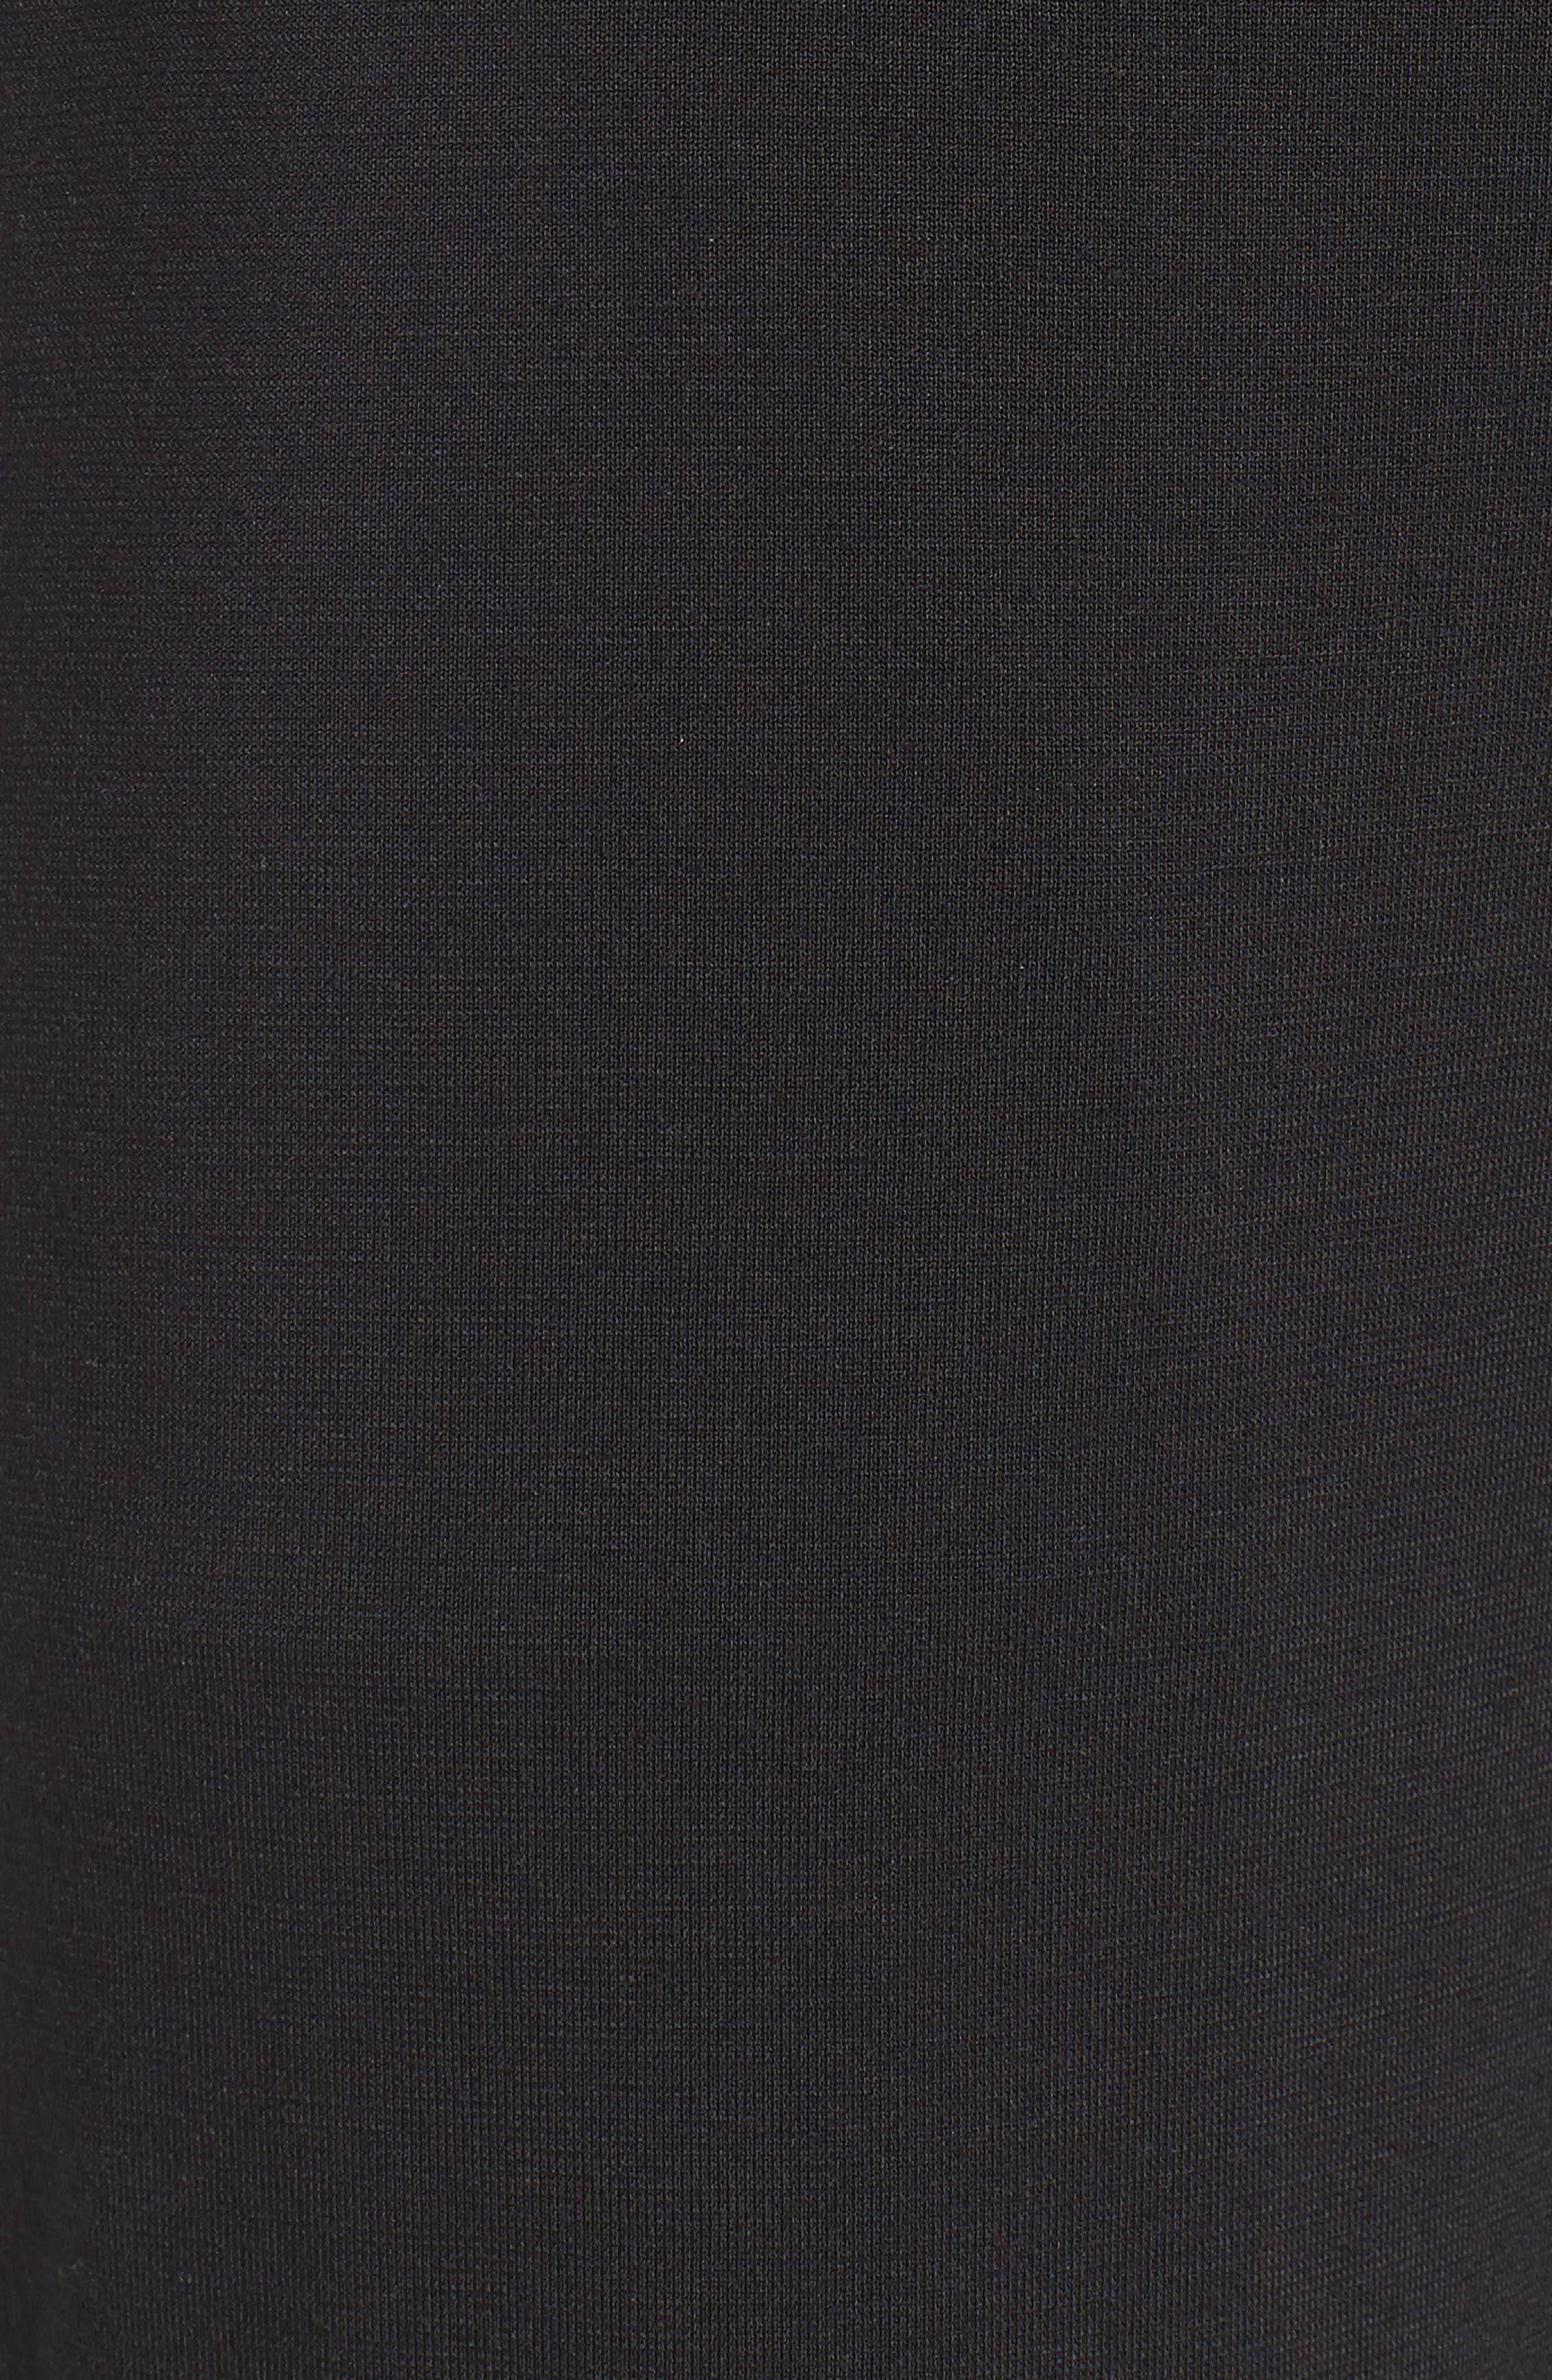 'U1143' Micromodal Lounge Pants,                             Alternate thumbnail 5, color,                             Black